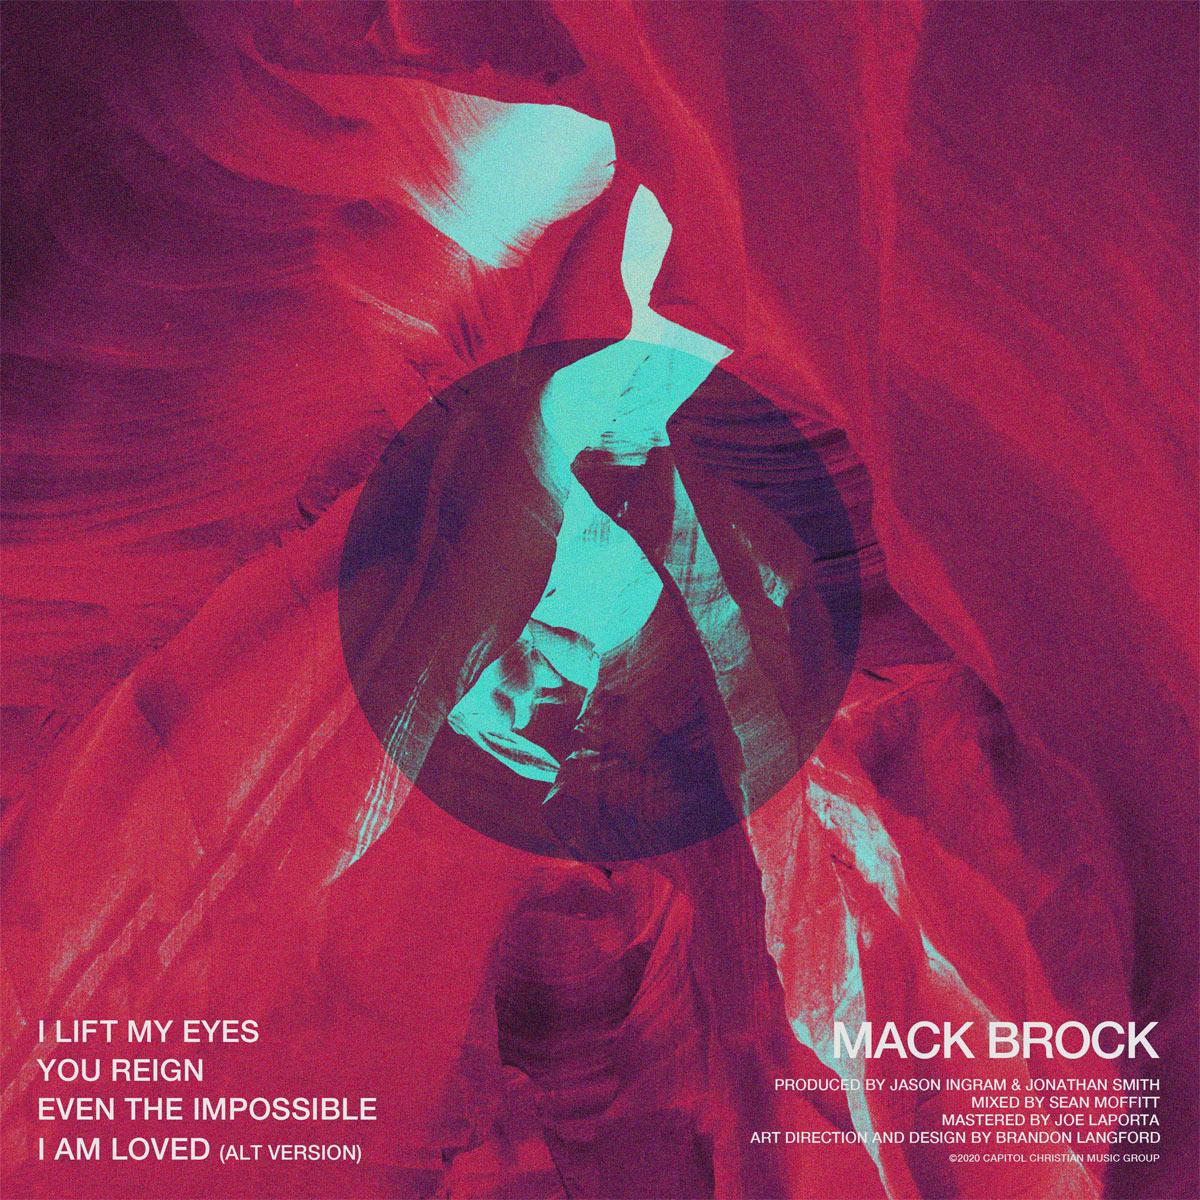 This Is Your Promise Album - Mack Brock